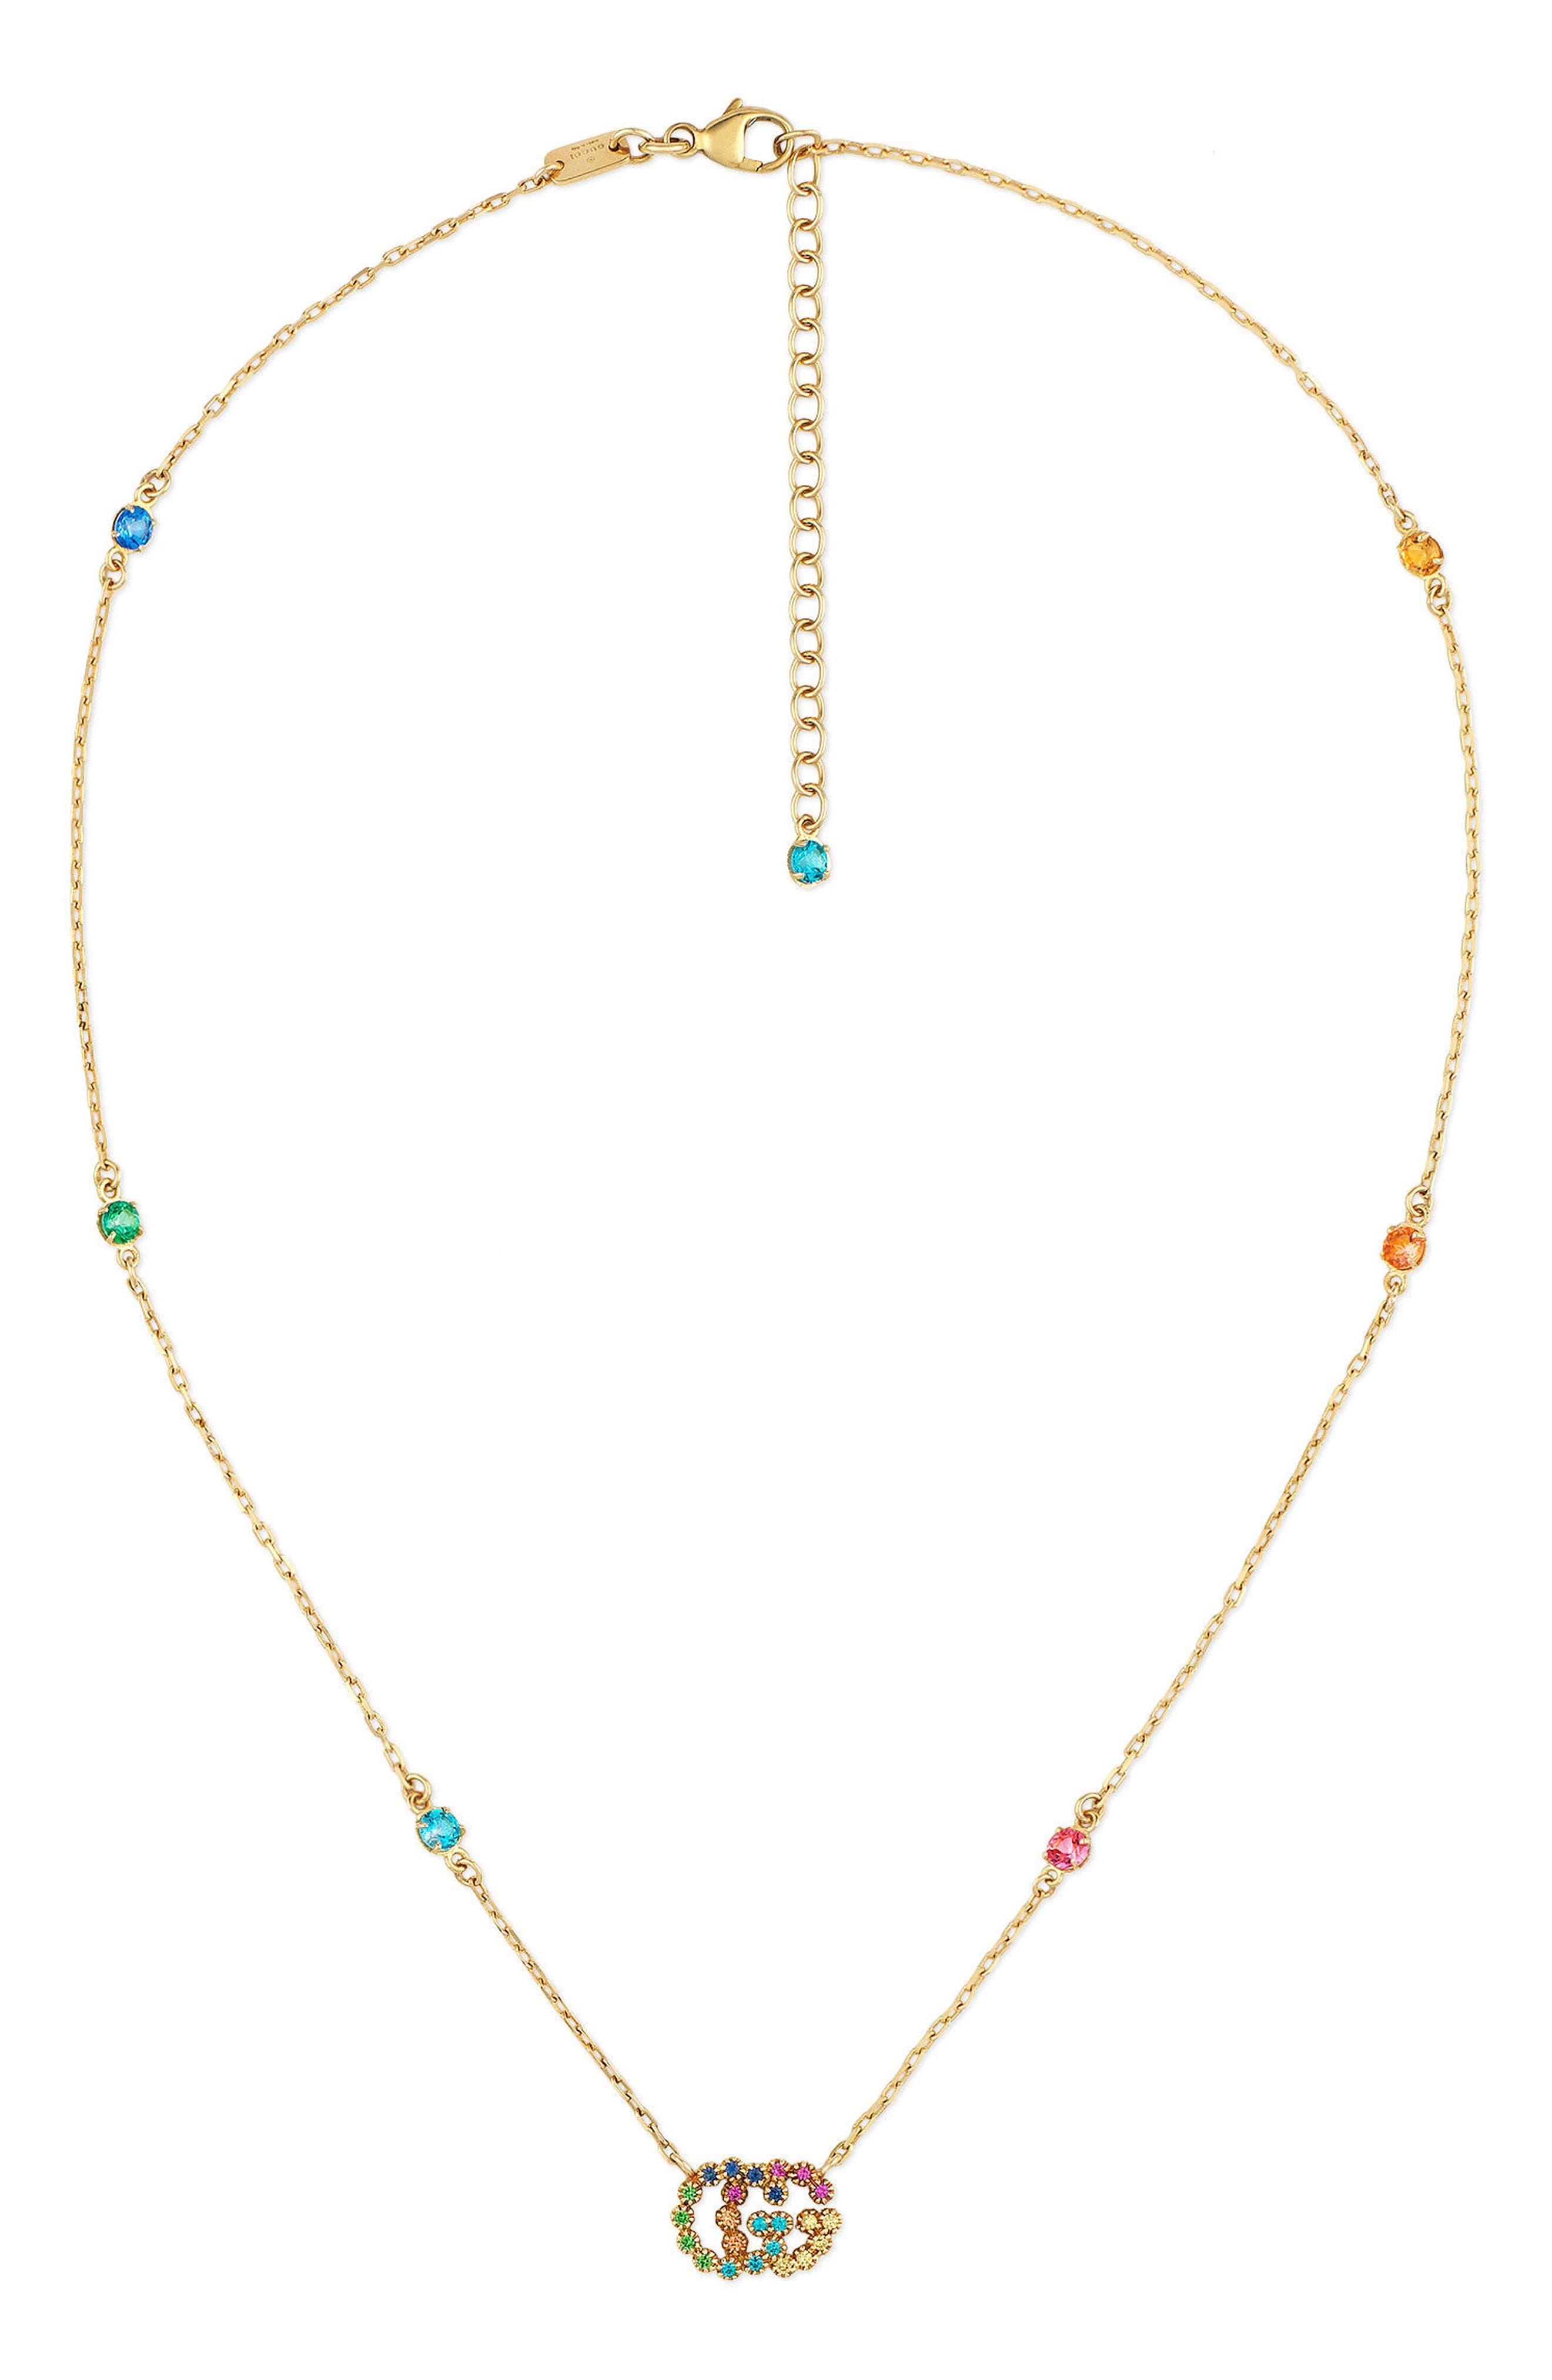 Alternate Image 1 Selected - Gucci Running G Semiprecius Stone Pendant Necklace